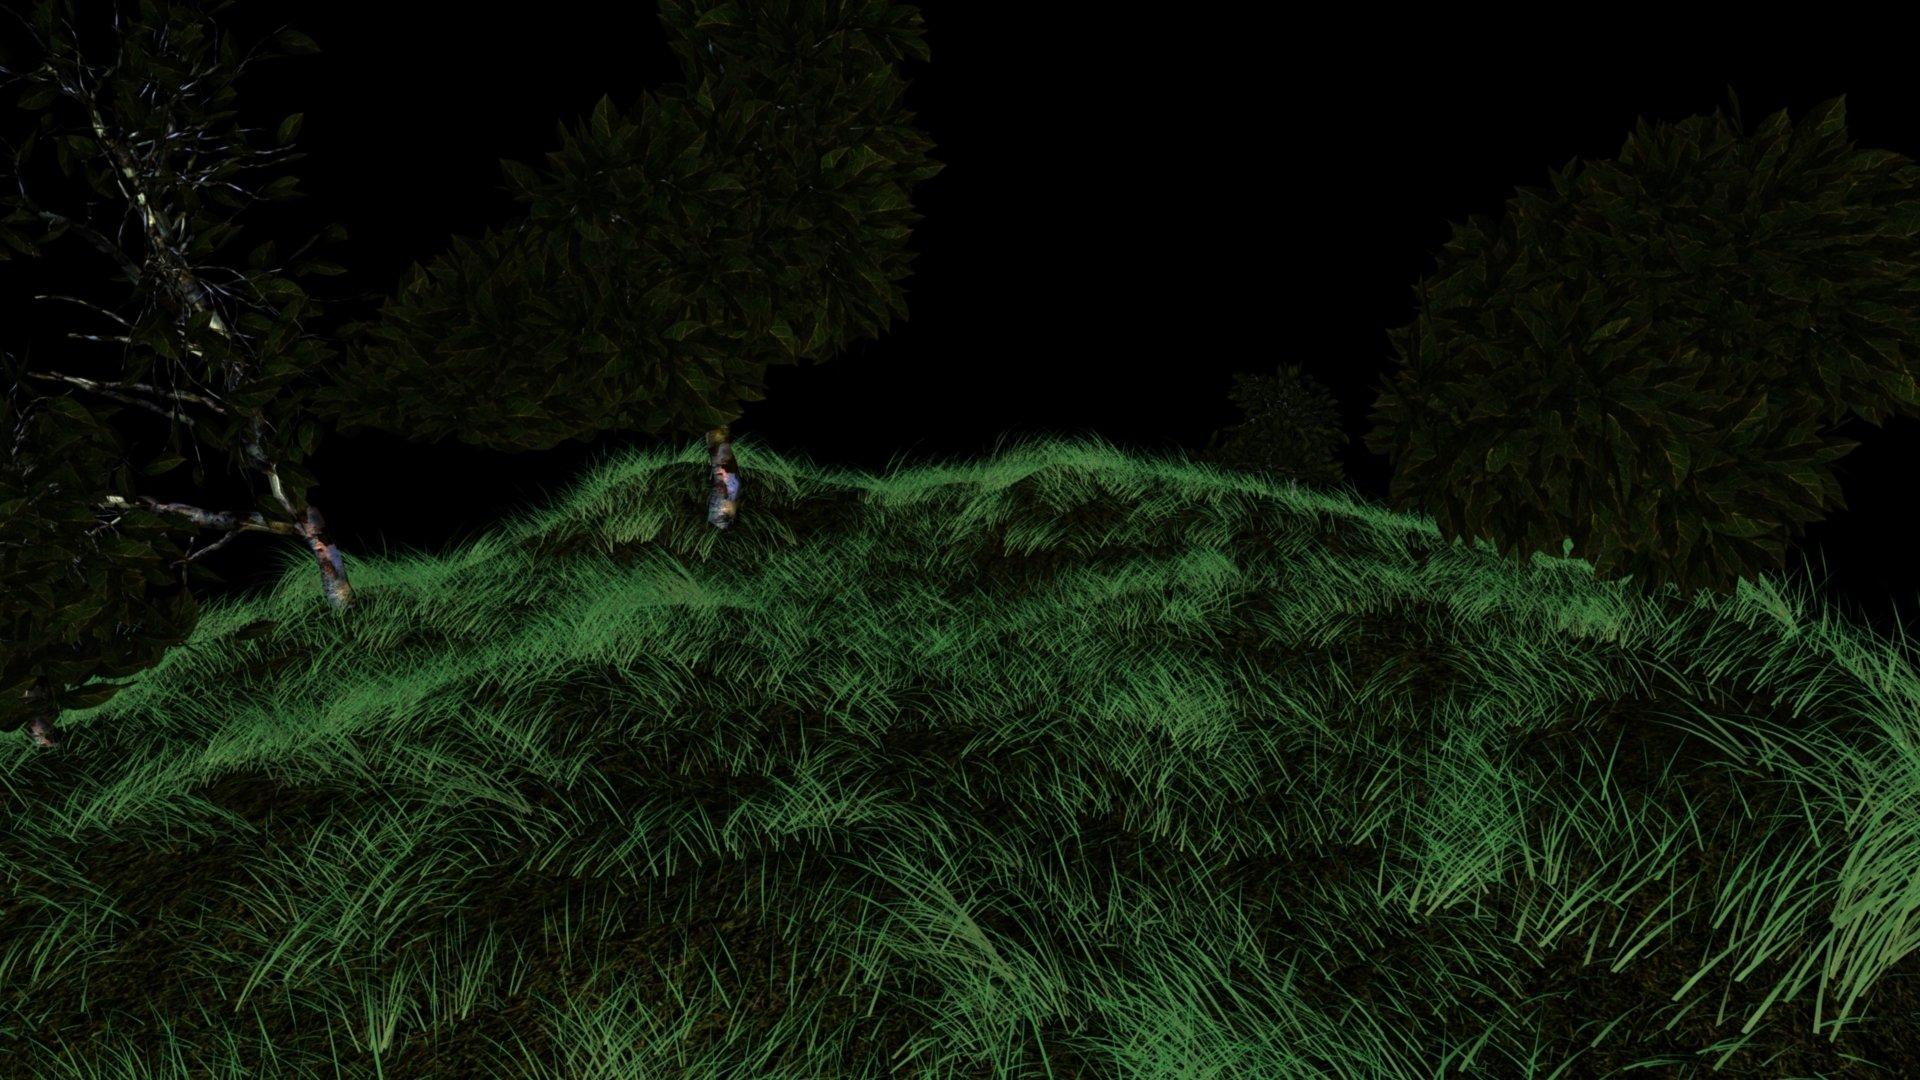 Visor trees in not rendering in vray for maya 2016  Help plz